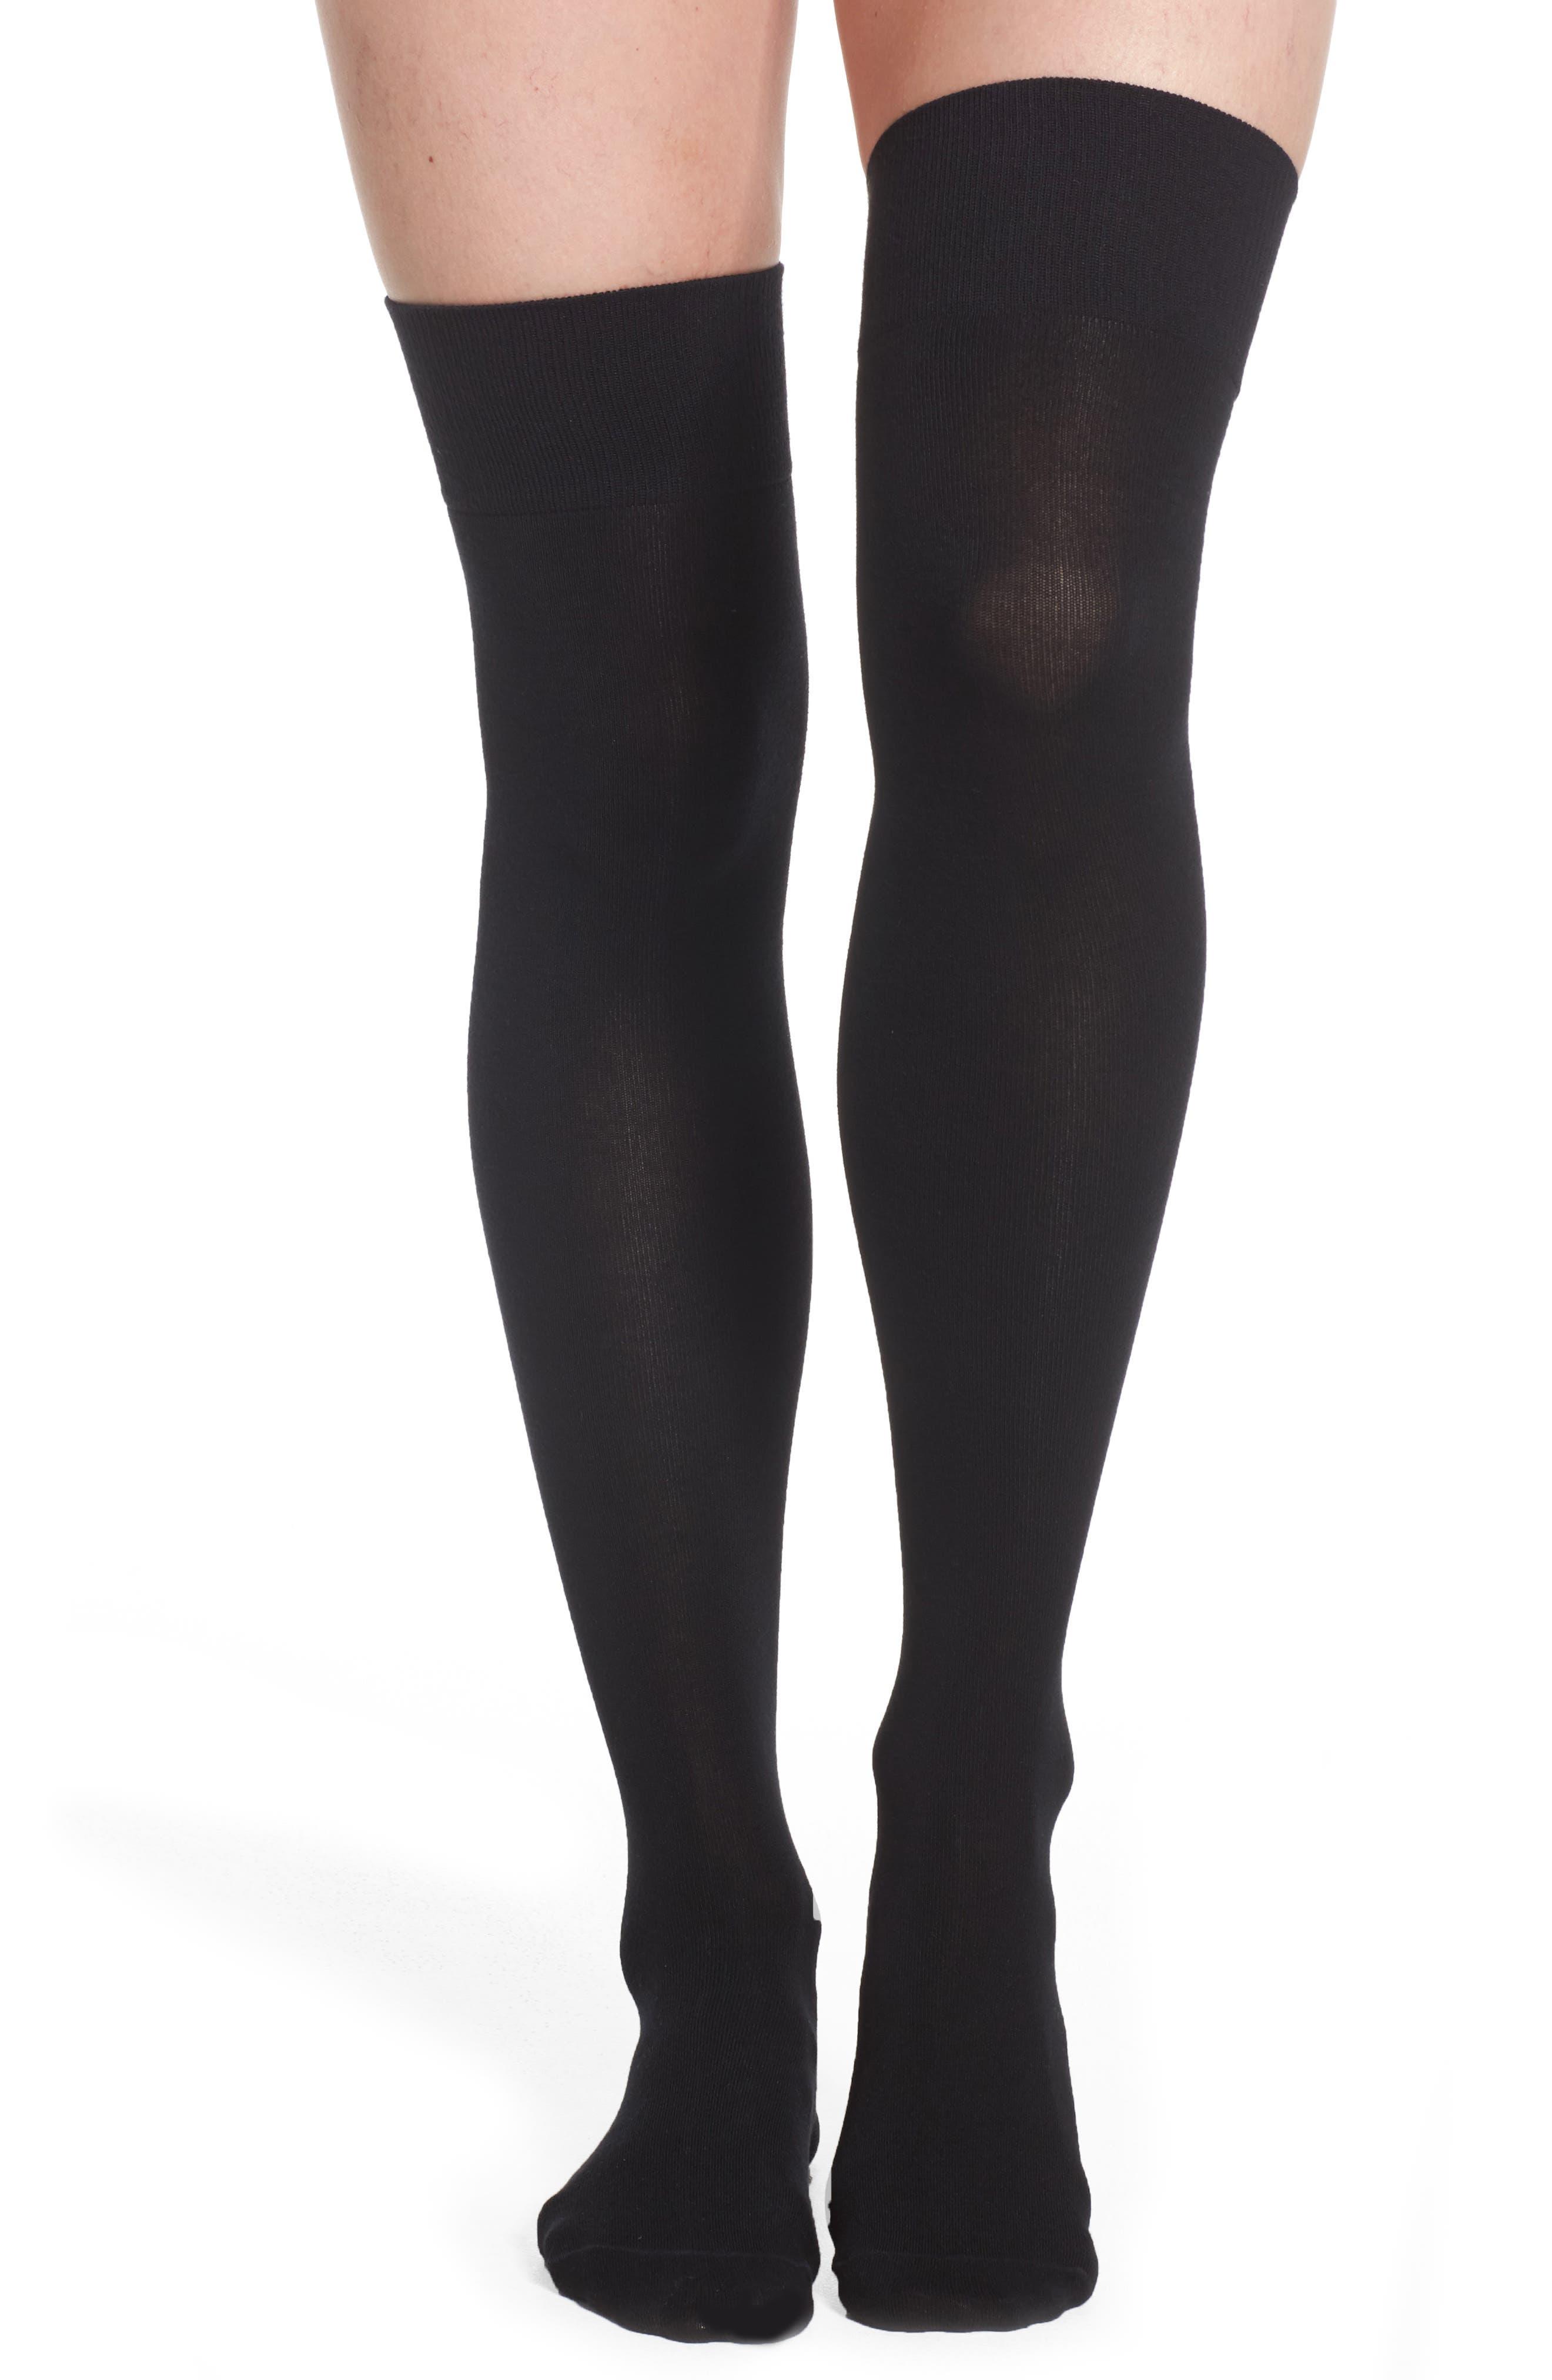 Alternate Image 1 Selected - Nordstrom Over the Knee Socks